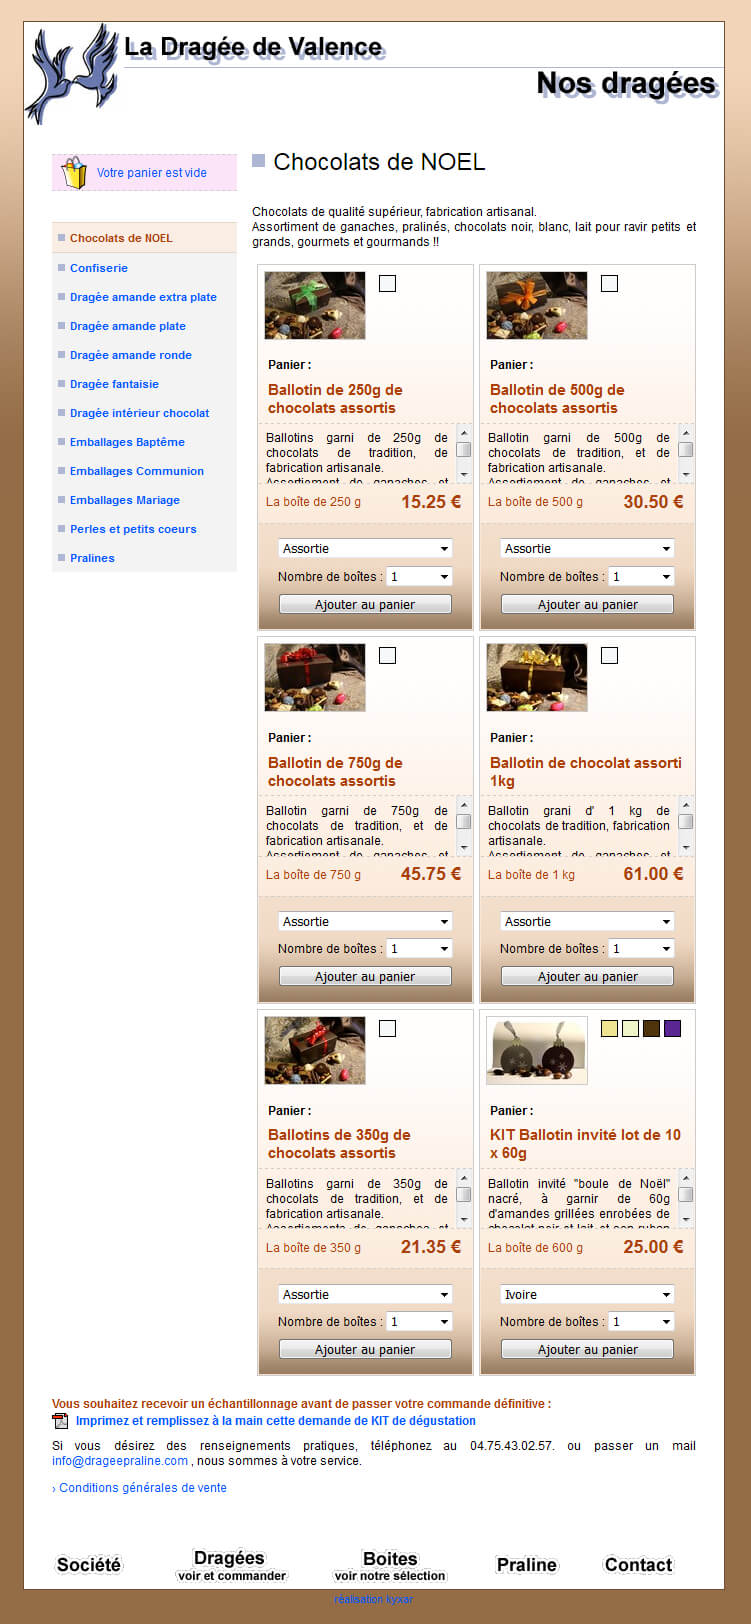 a8af63bcab0 Drageepraline.com - Etude de cas Refonte boutique en ligne